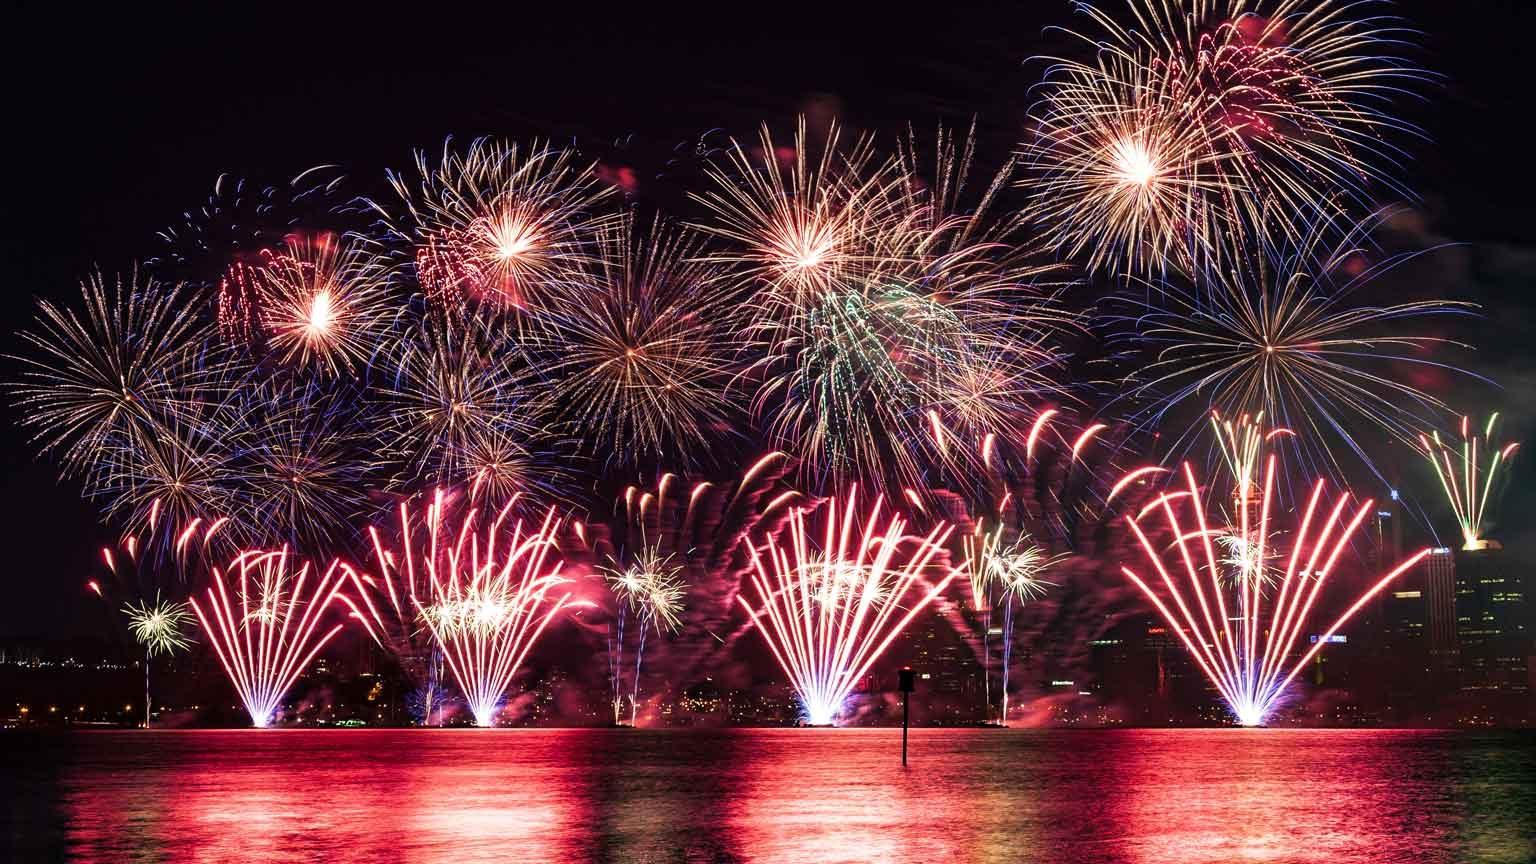 Australia Day fireworks over the Swan River Perth, Western Australia